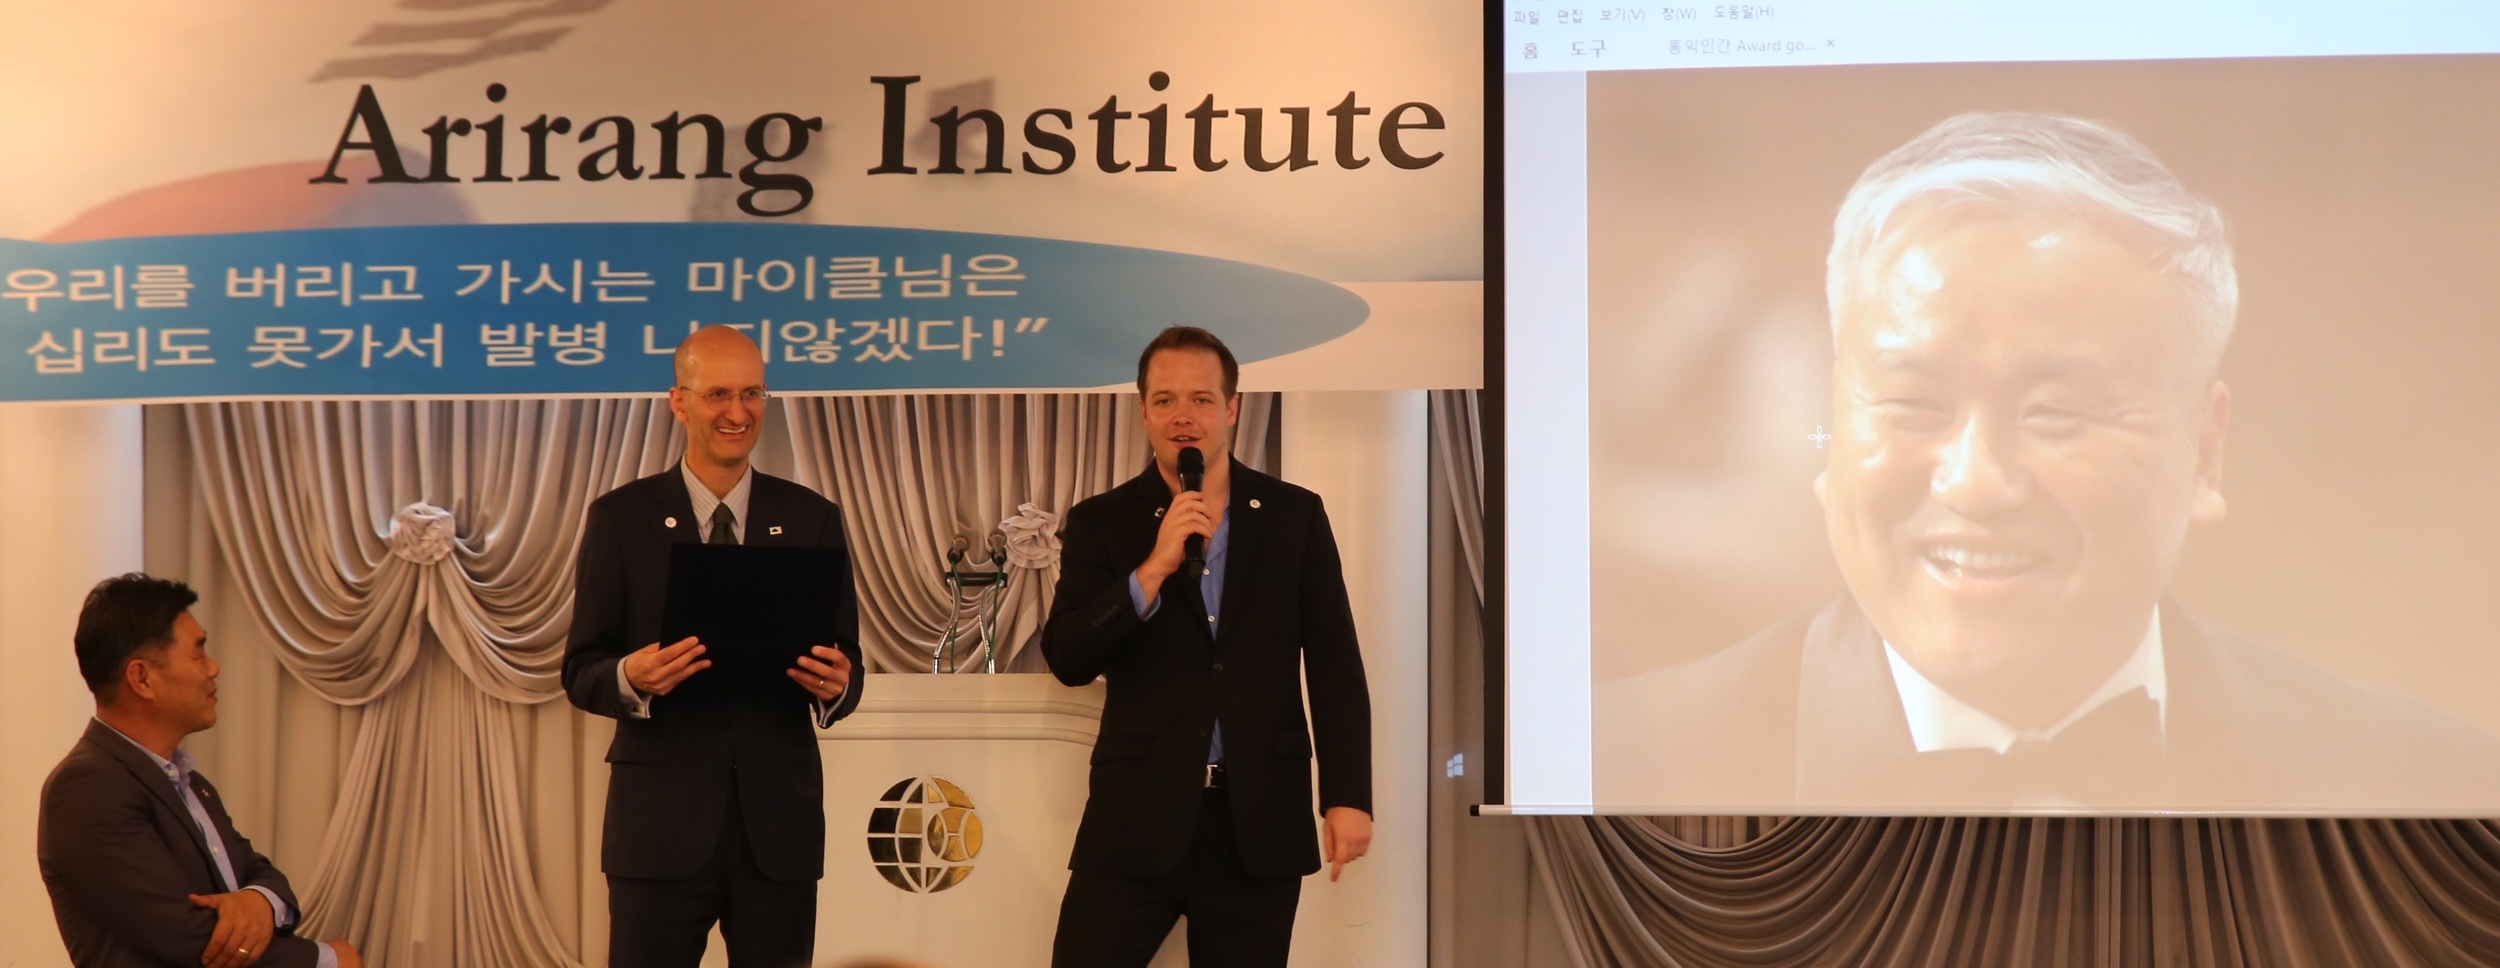 Mr. Andy Kim, Professor Emanuel Pastreich,Mr. Michael Lammbrau, on the screen (Deacon Joseph Pak)